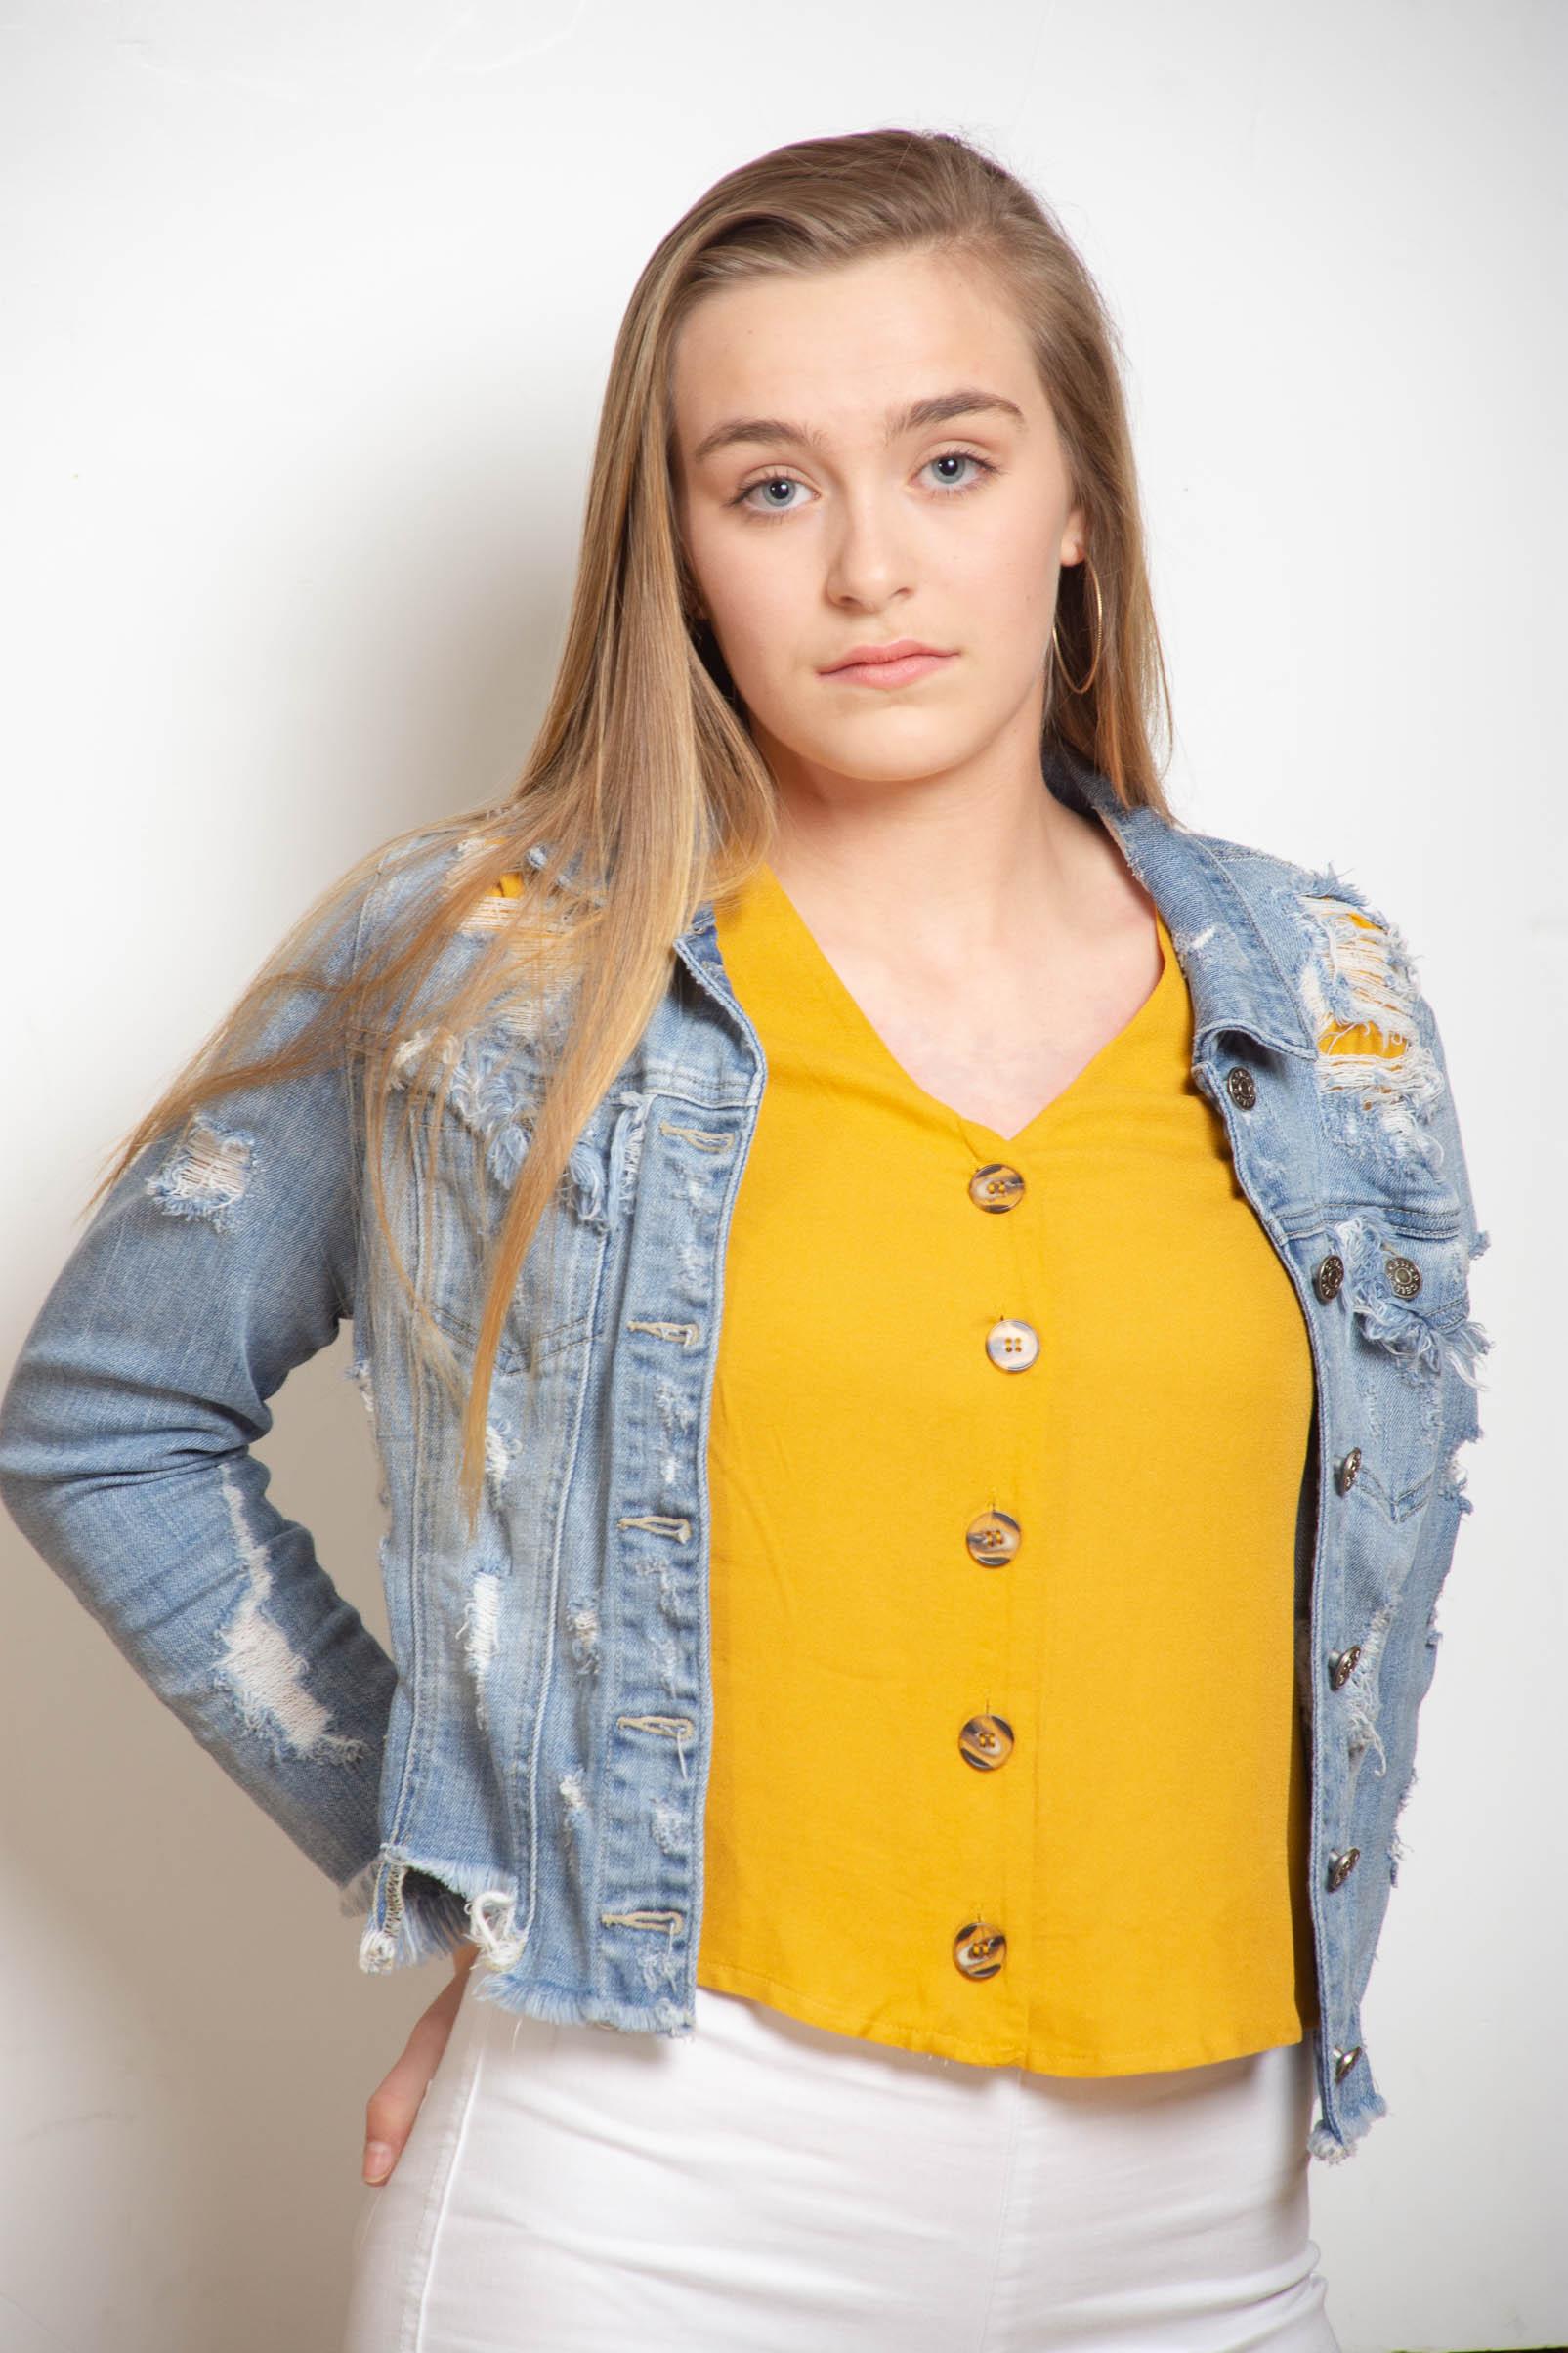 Ellington - Model / Dancer / Actress